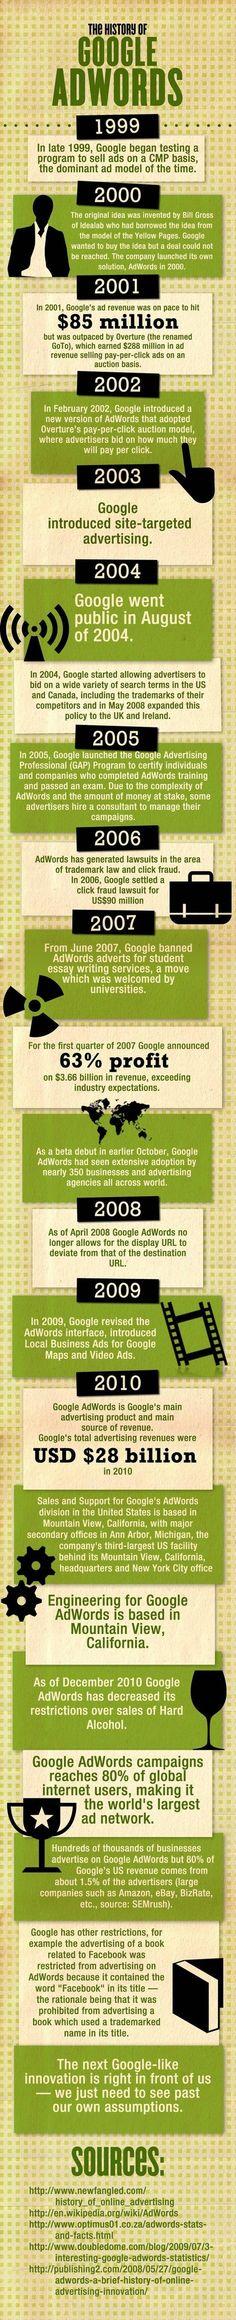 Historia de Google Adwords - #infografia / The history of Google adwords - #infographic